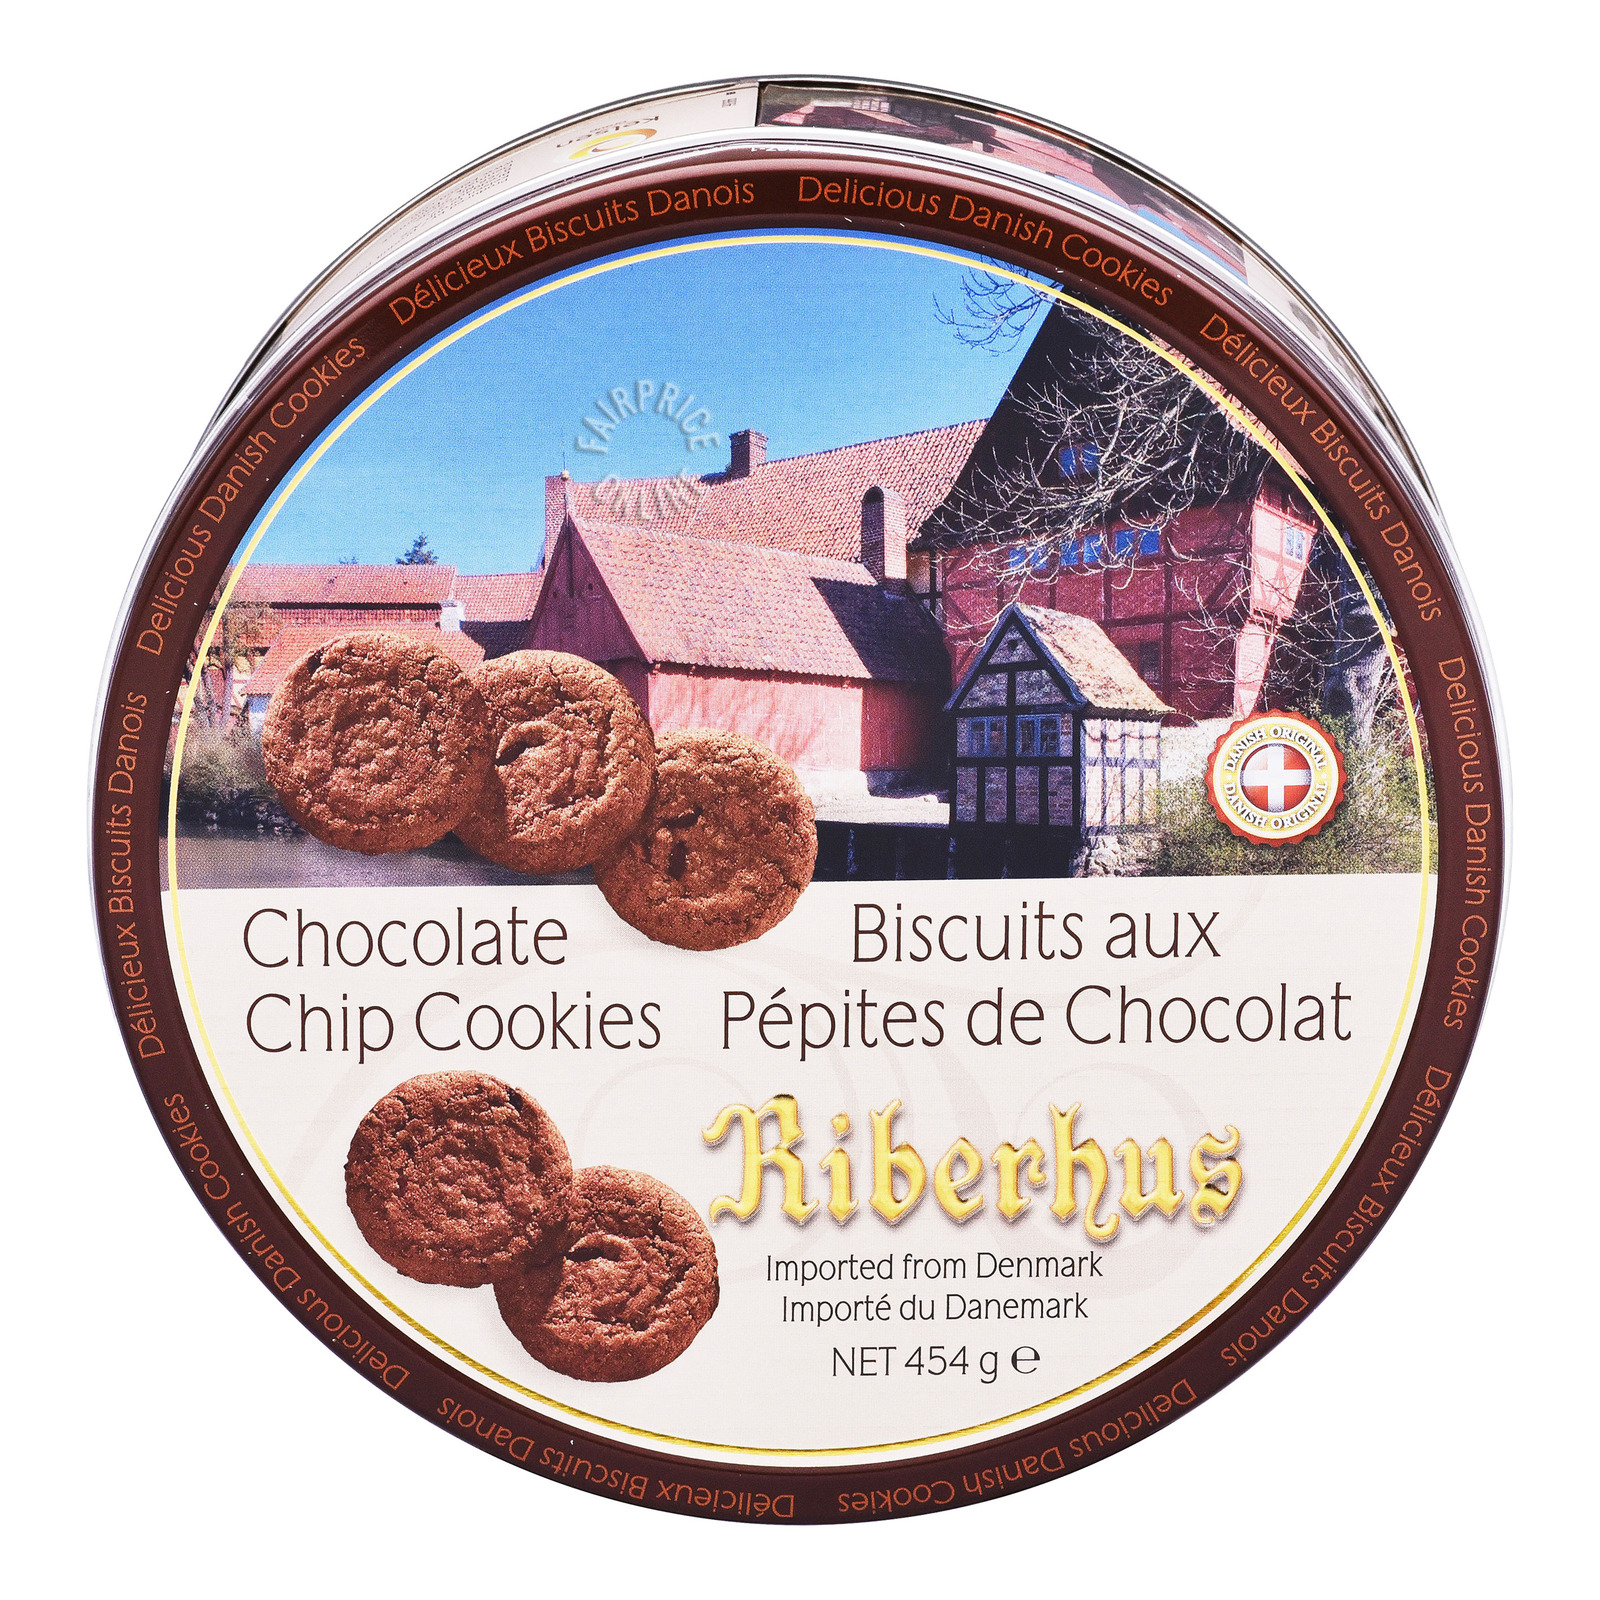 Riberhus Tin Cookies - Chocolate Chip